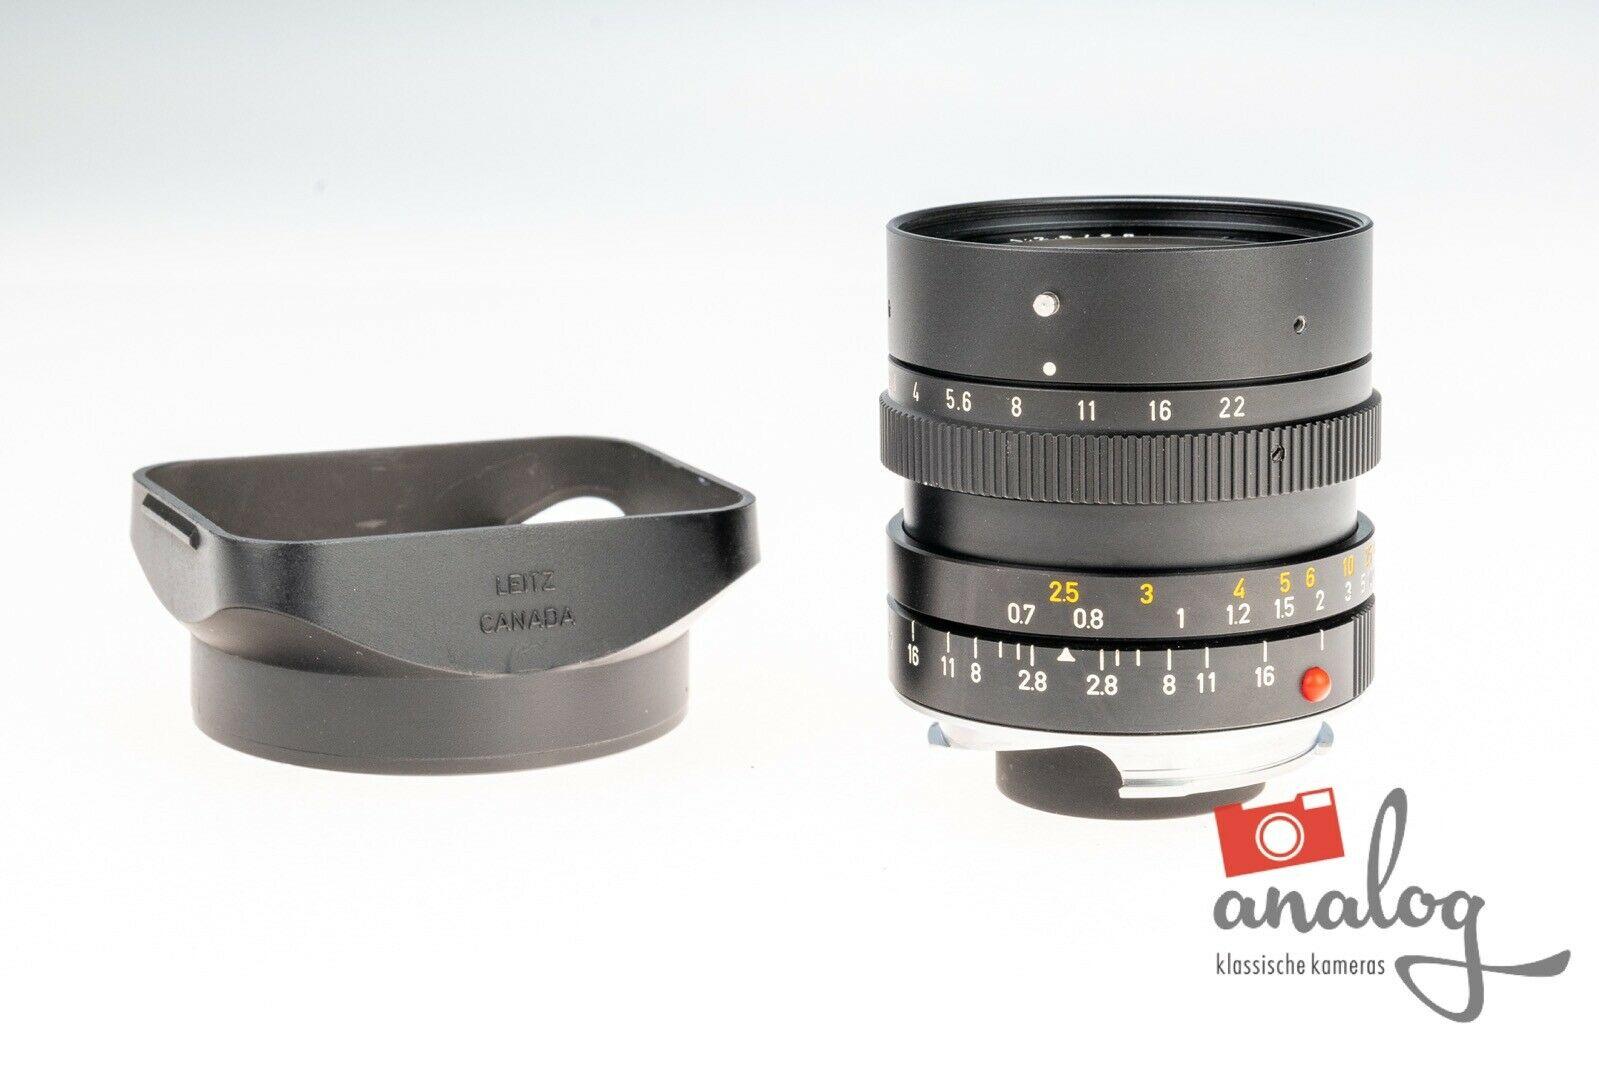 Leica Elmarit-M 28mm 2.8 E49 - 11804 (III) - werkstattüberholt